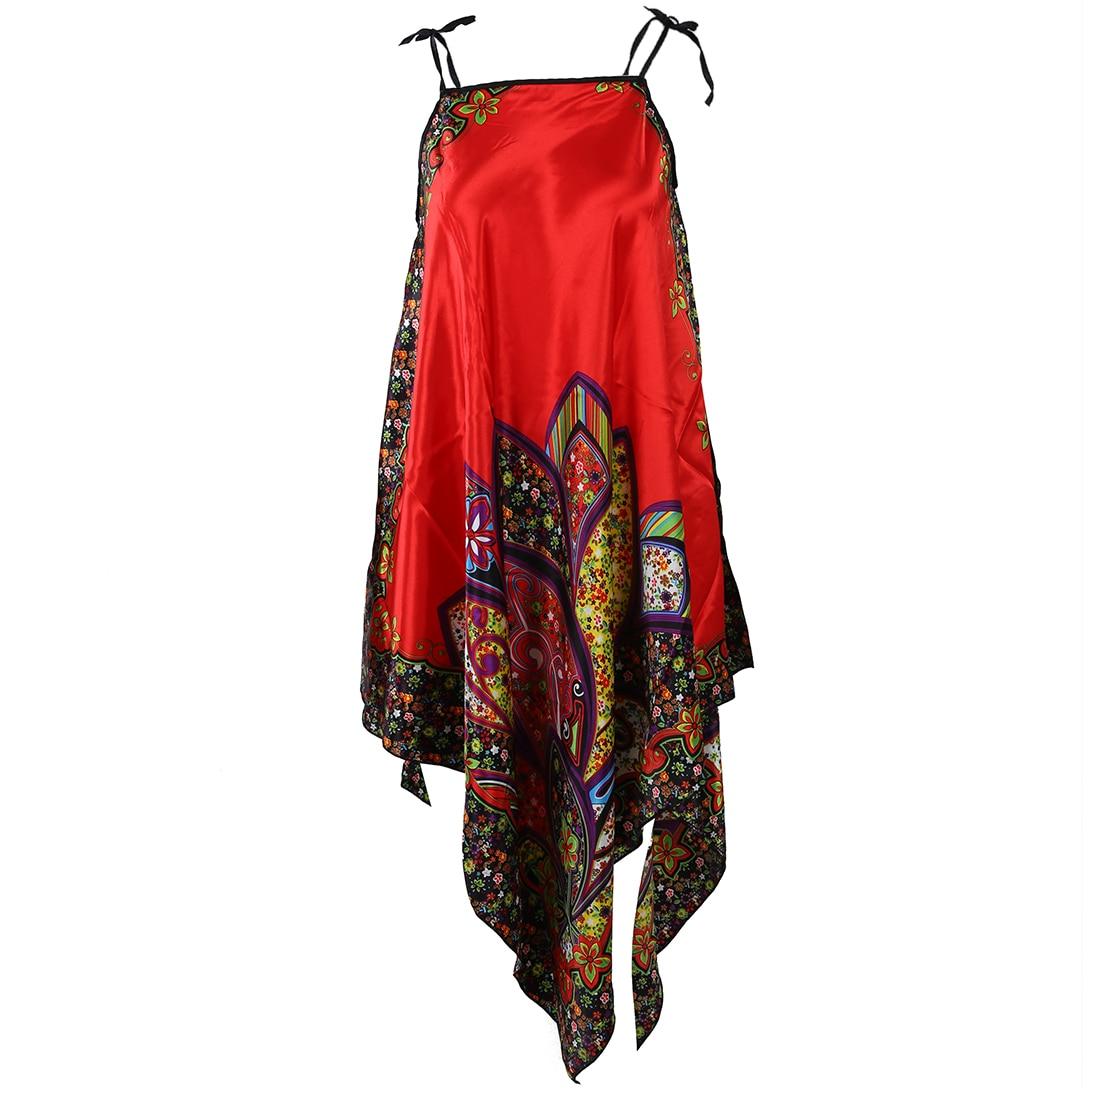 Women's Sleep shirts Casual Nightgown Nightdress